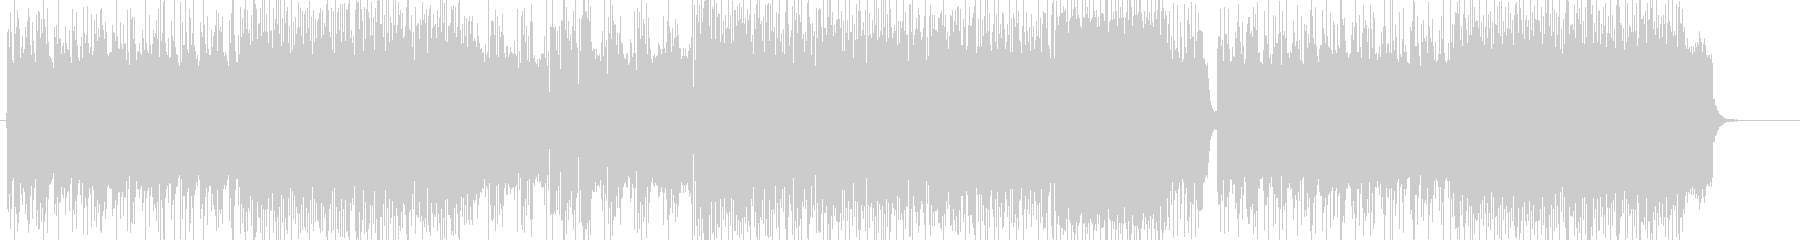 「HR/HM」「DARK」BGM50の未再生の波形